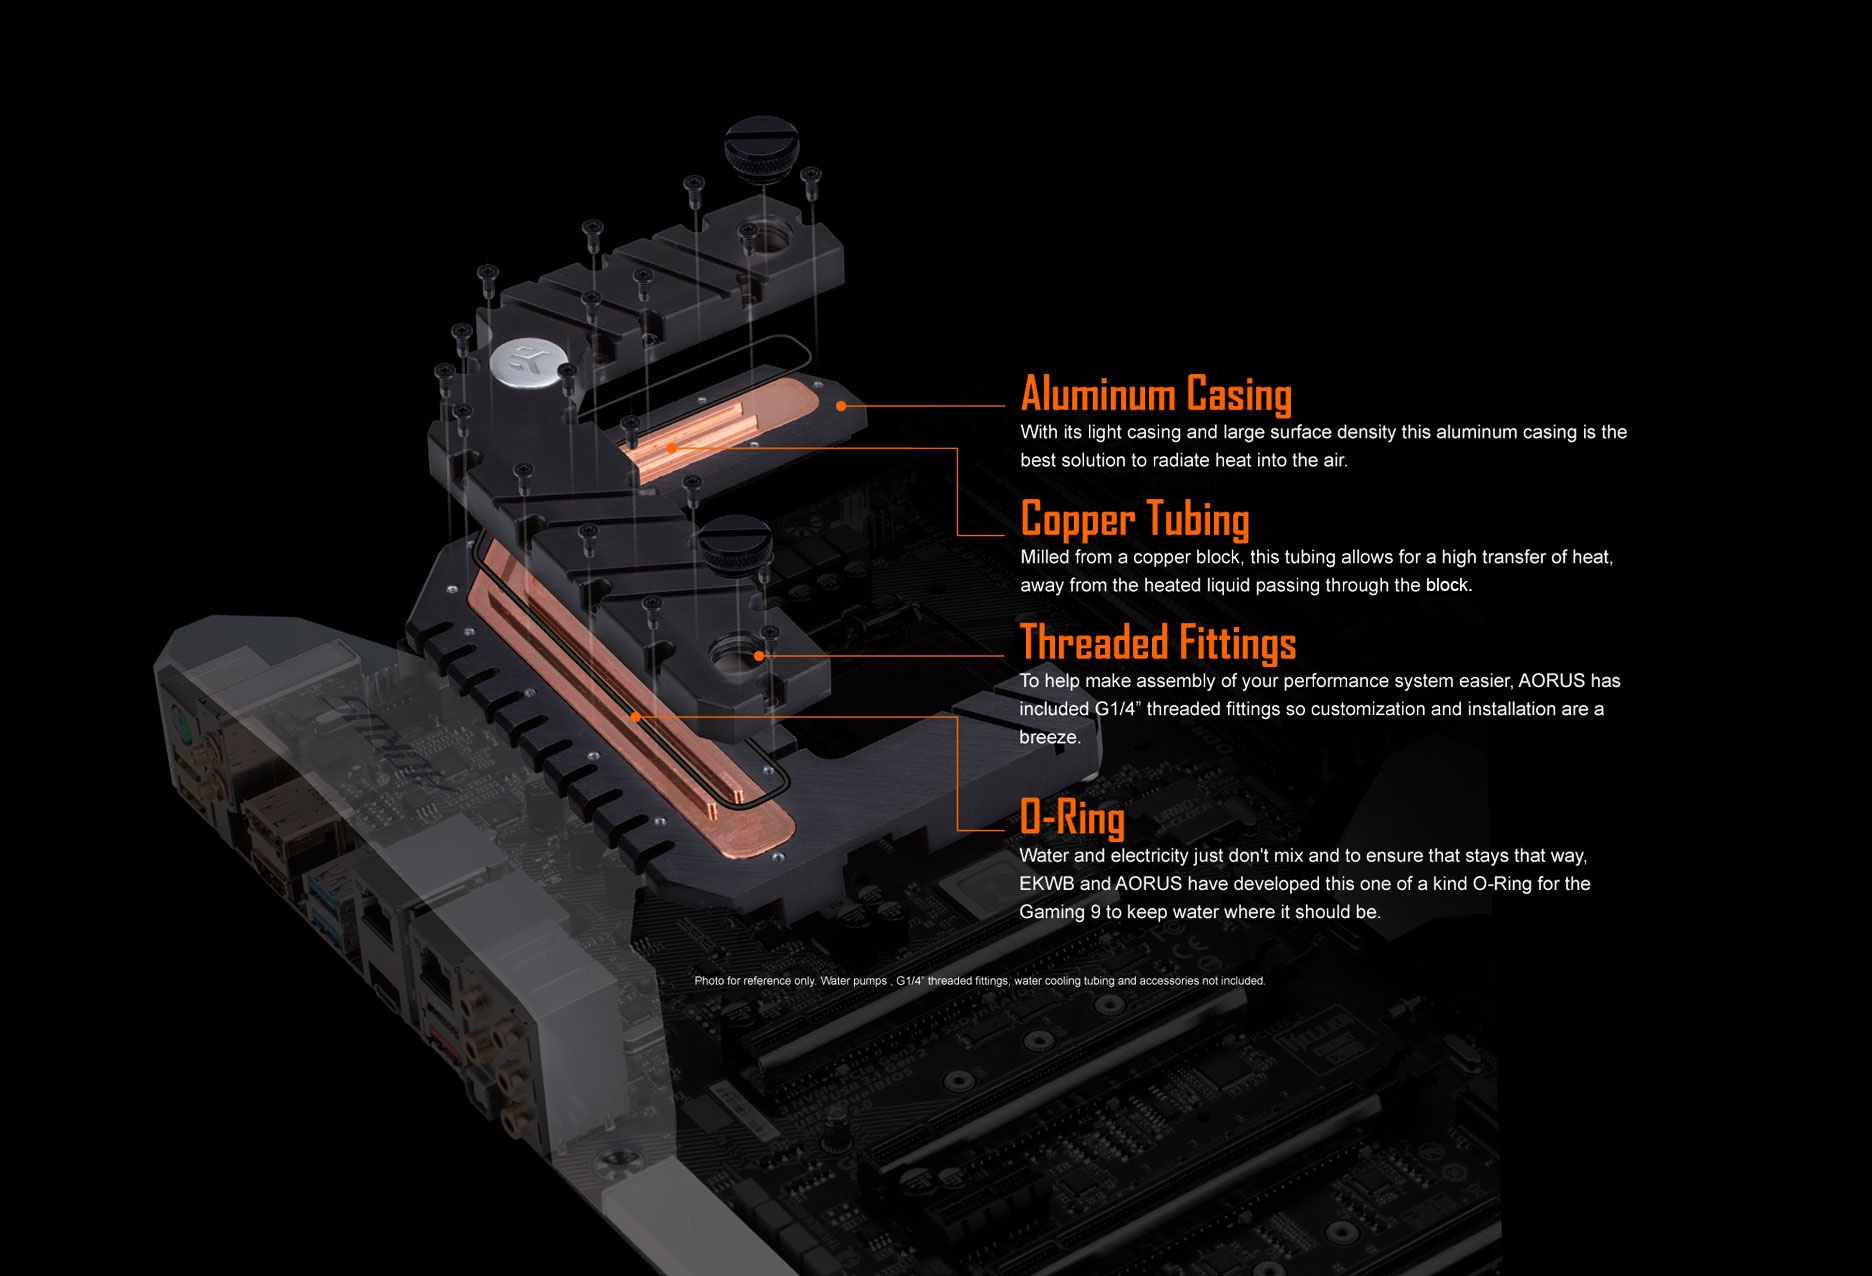 Gigabyte Aorus GA-Z270X-Gaming 9 - G-Frost Hybrid Water Block